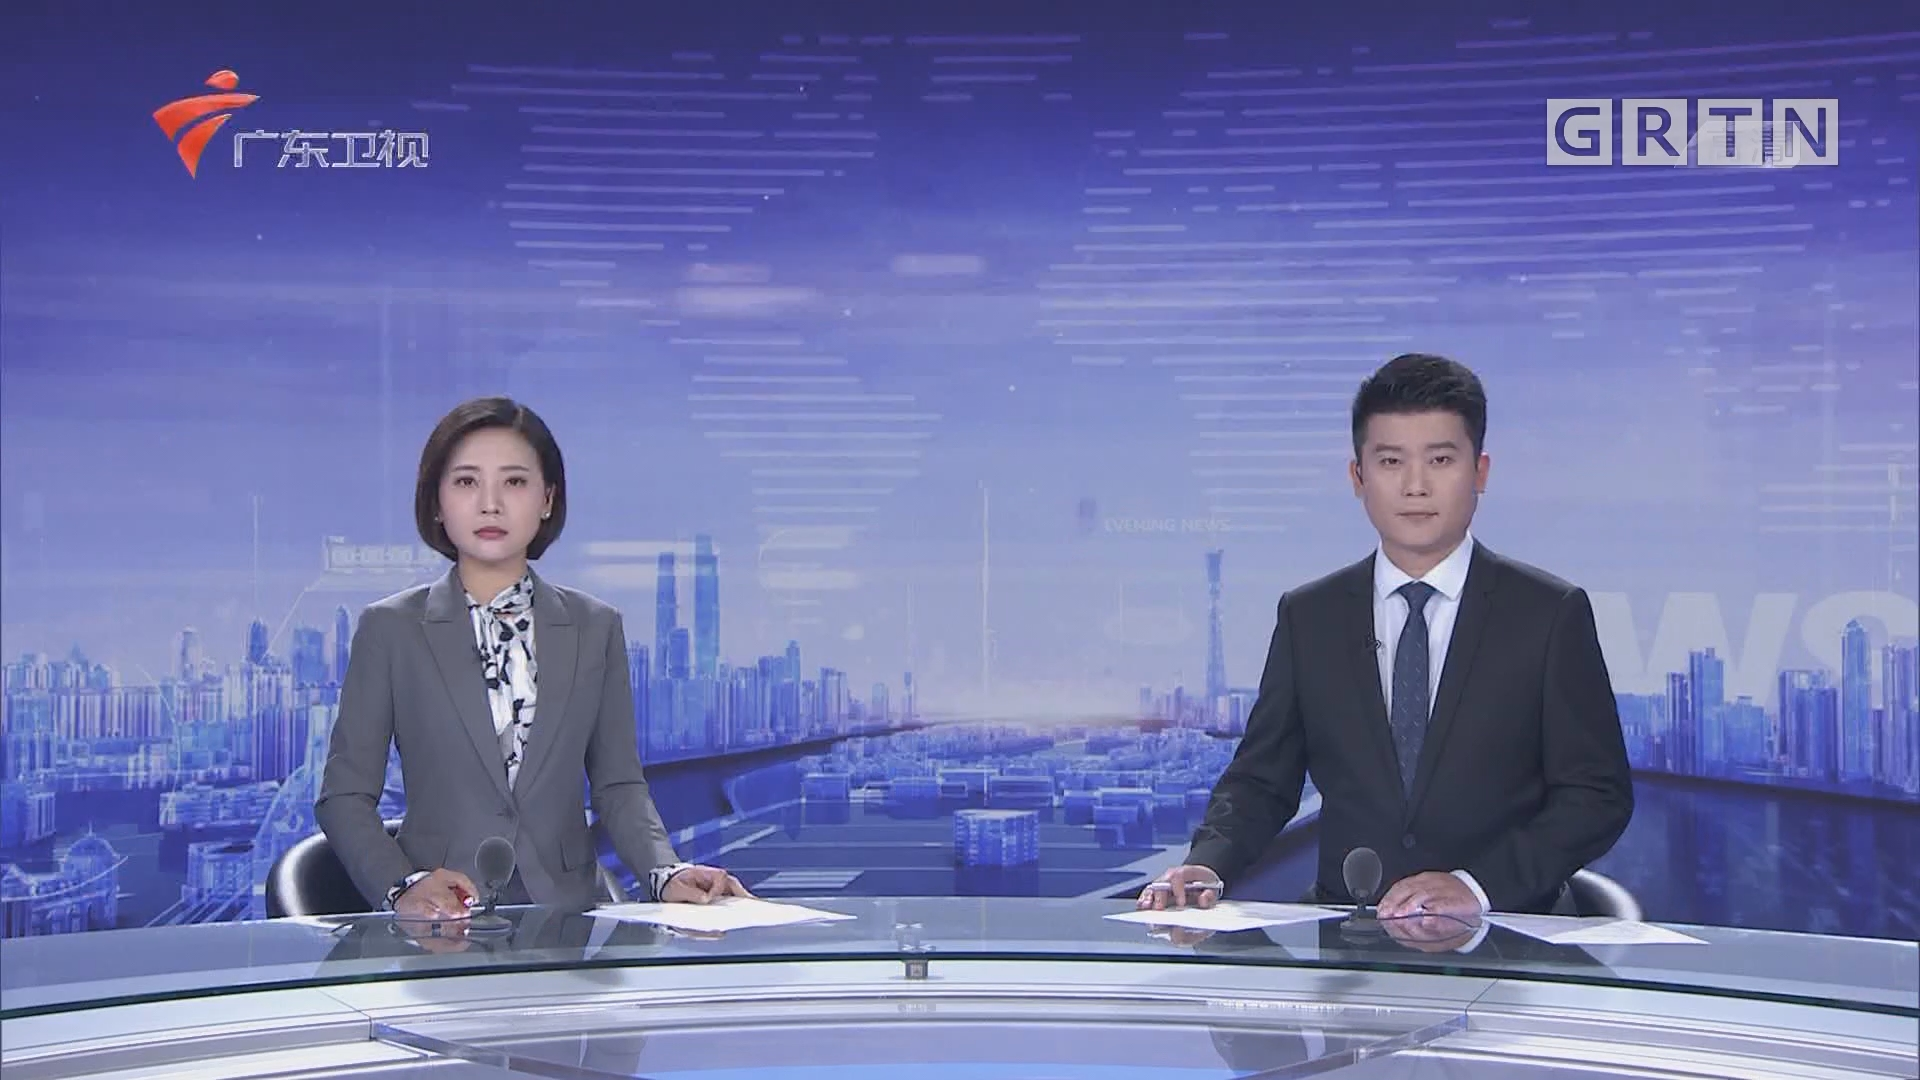 [HD][2019-12-03]晚间新闻:纪念澳门特别行政区基本法实施20周年座谈会在京举行